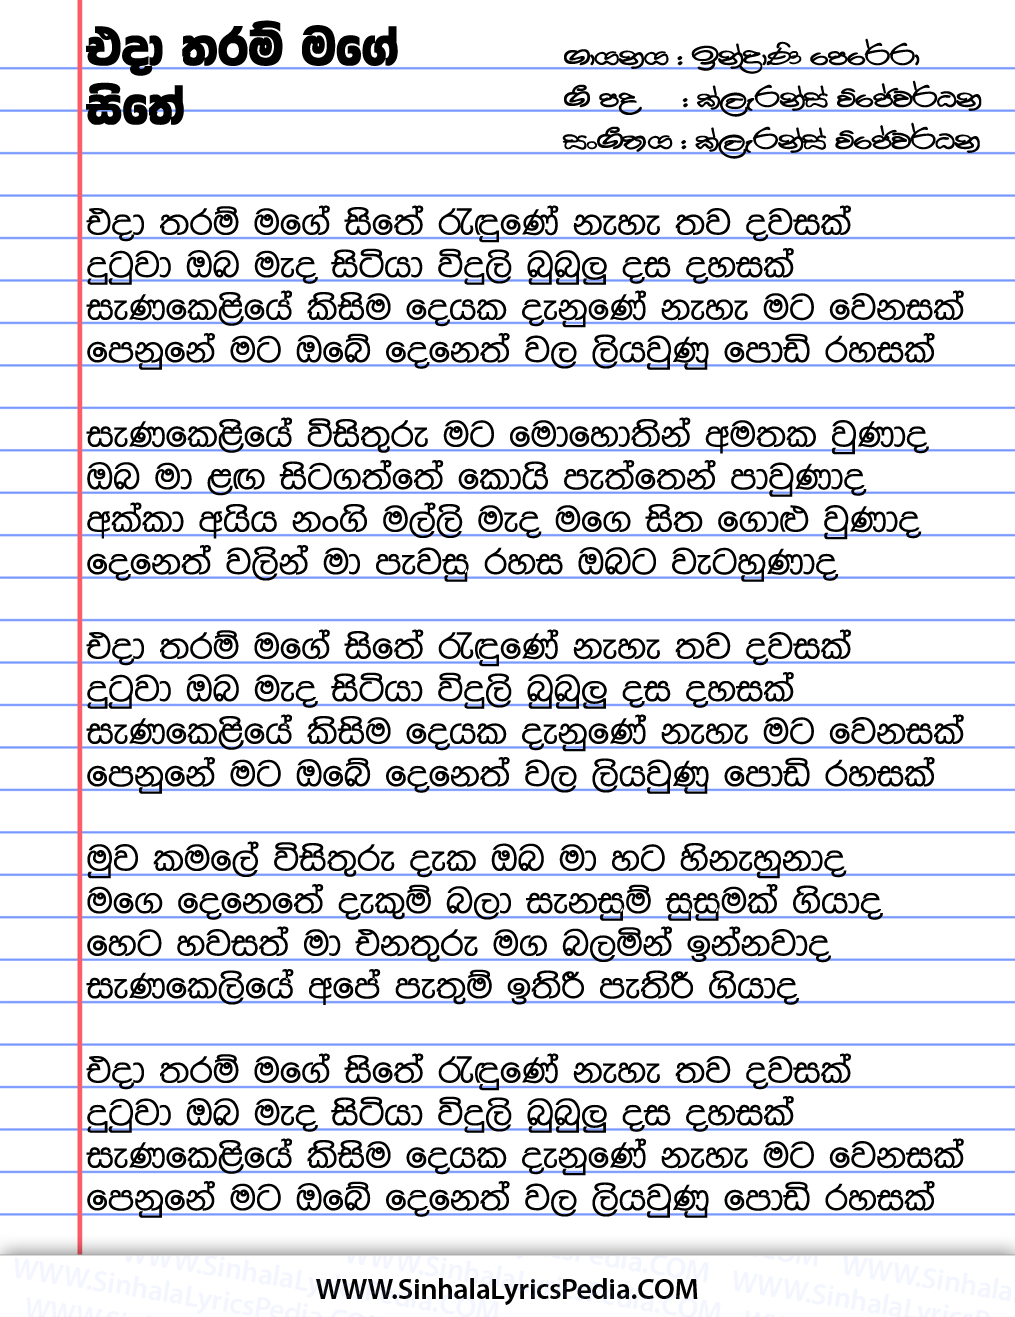 Eda Tharam Mage Sithe Song Lyrics